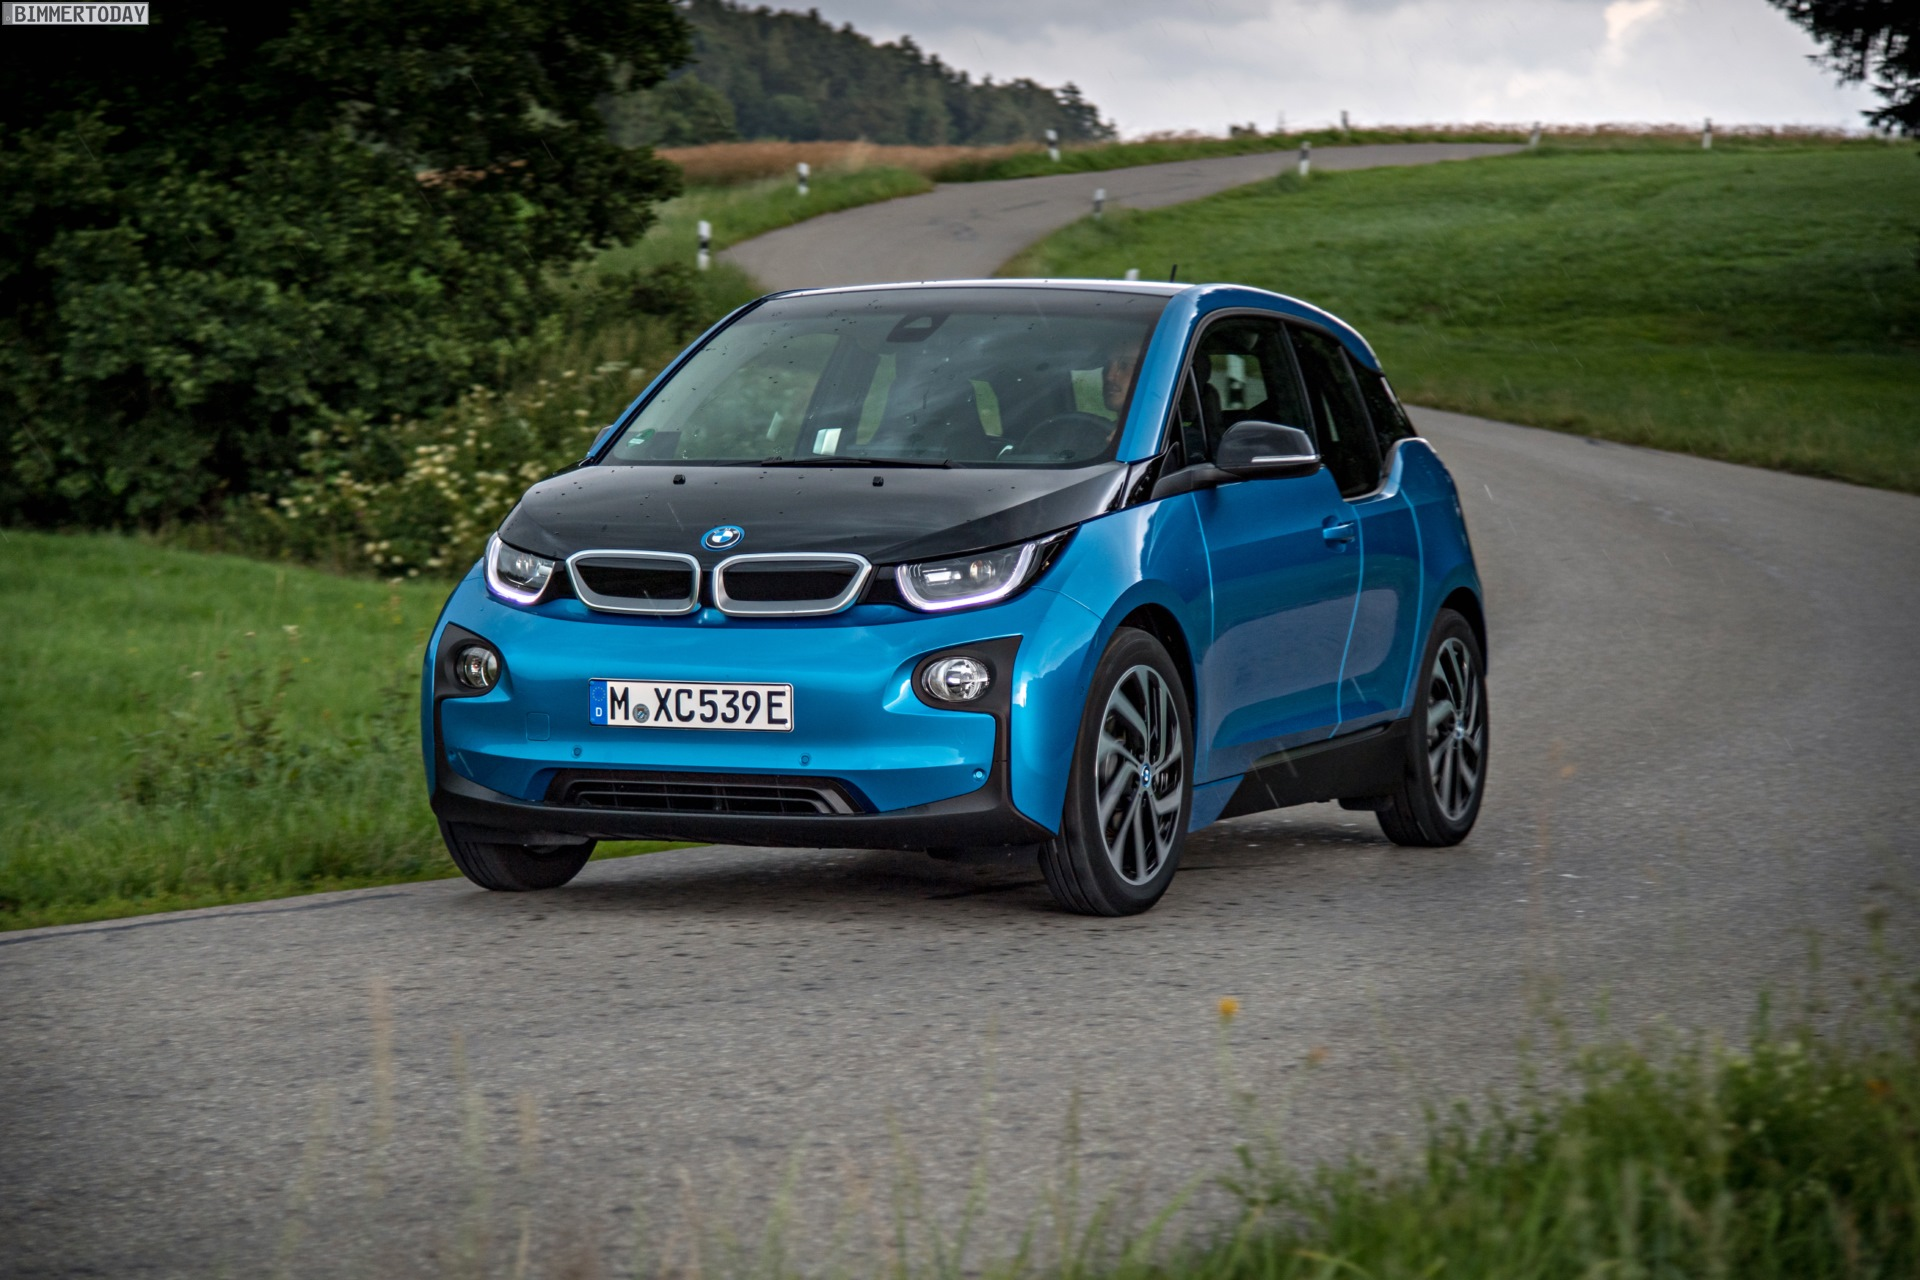 2016 BMW i3 94Ah Protonic Blue 33 kWh Elektroauto 15